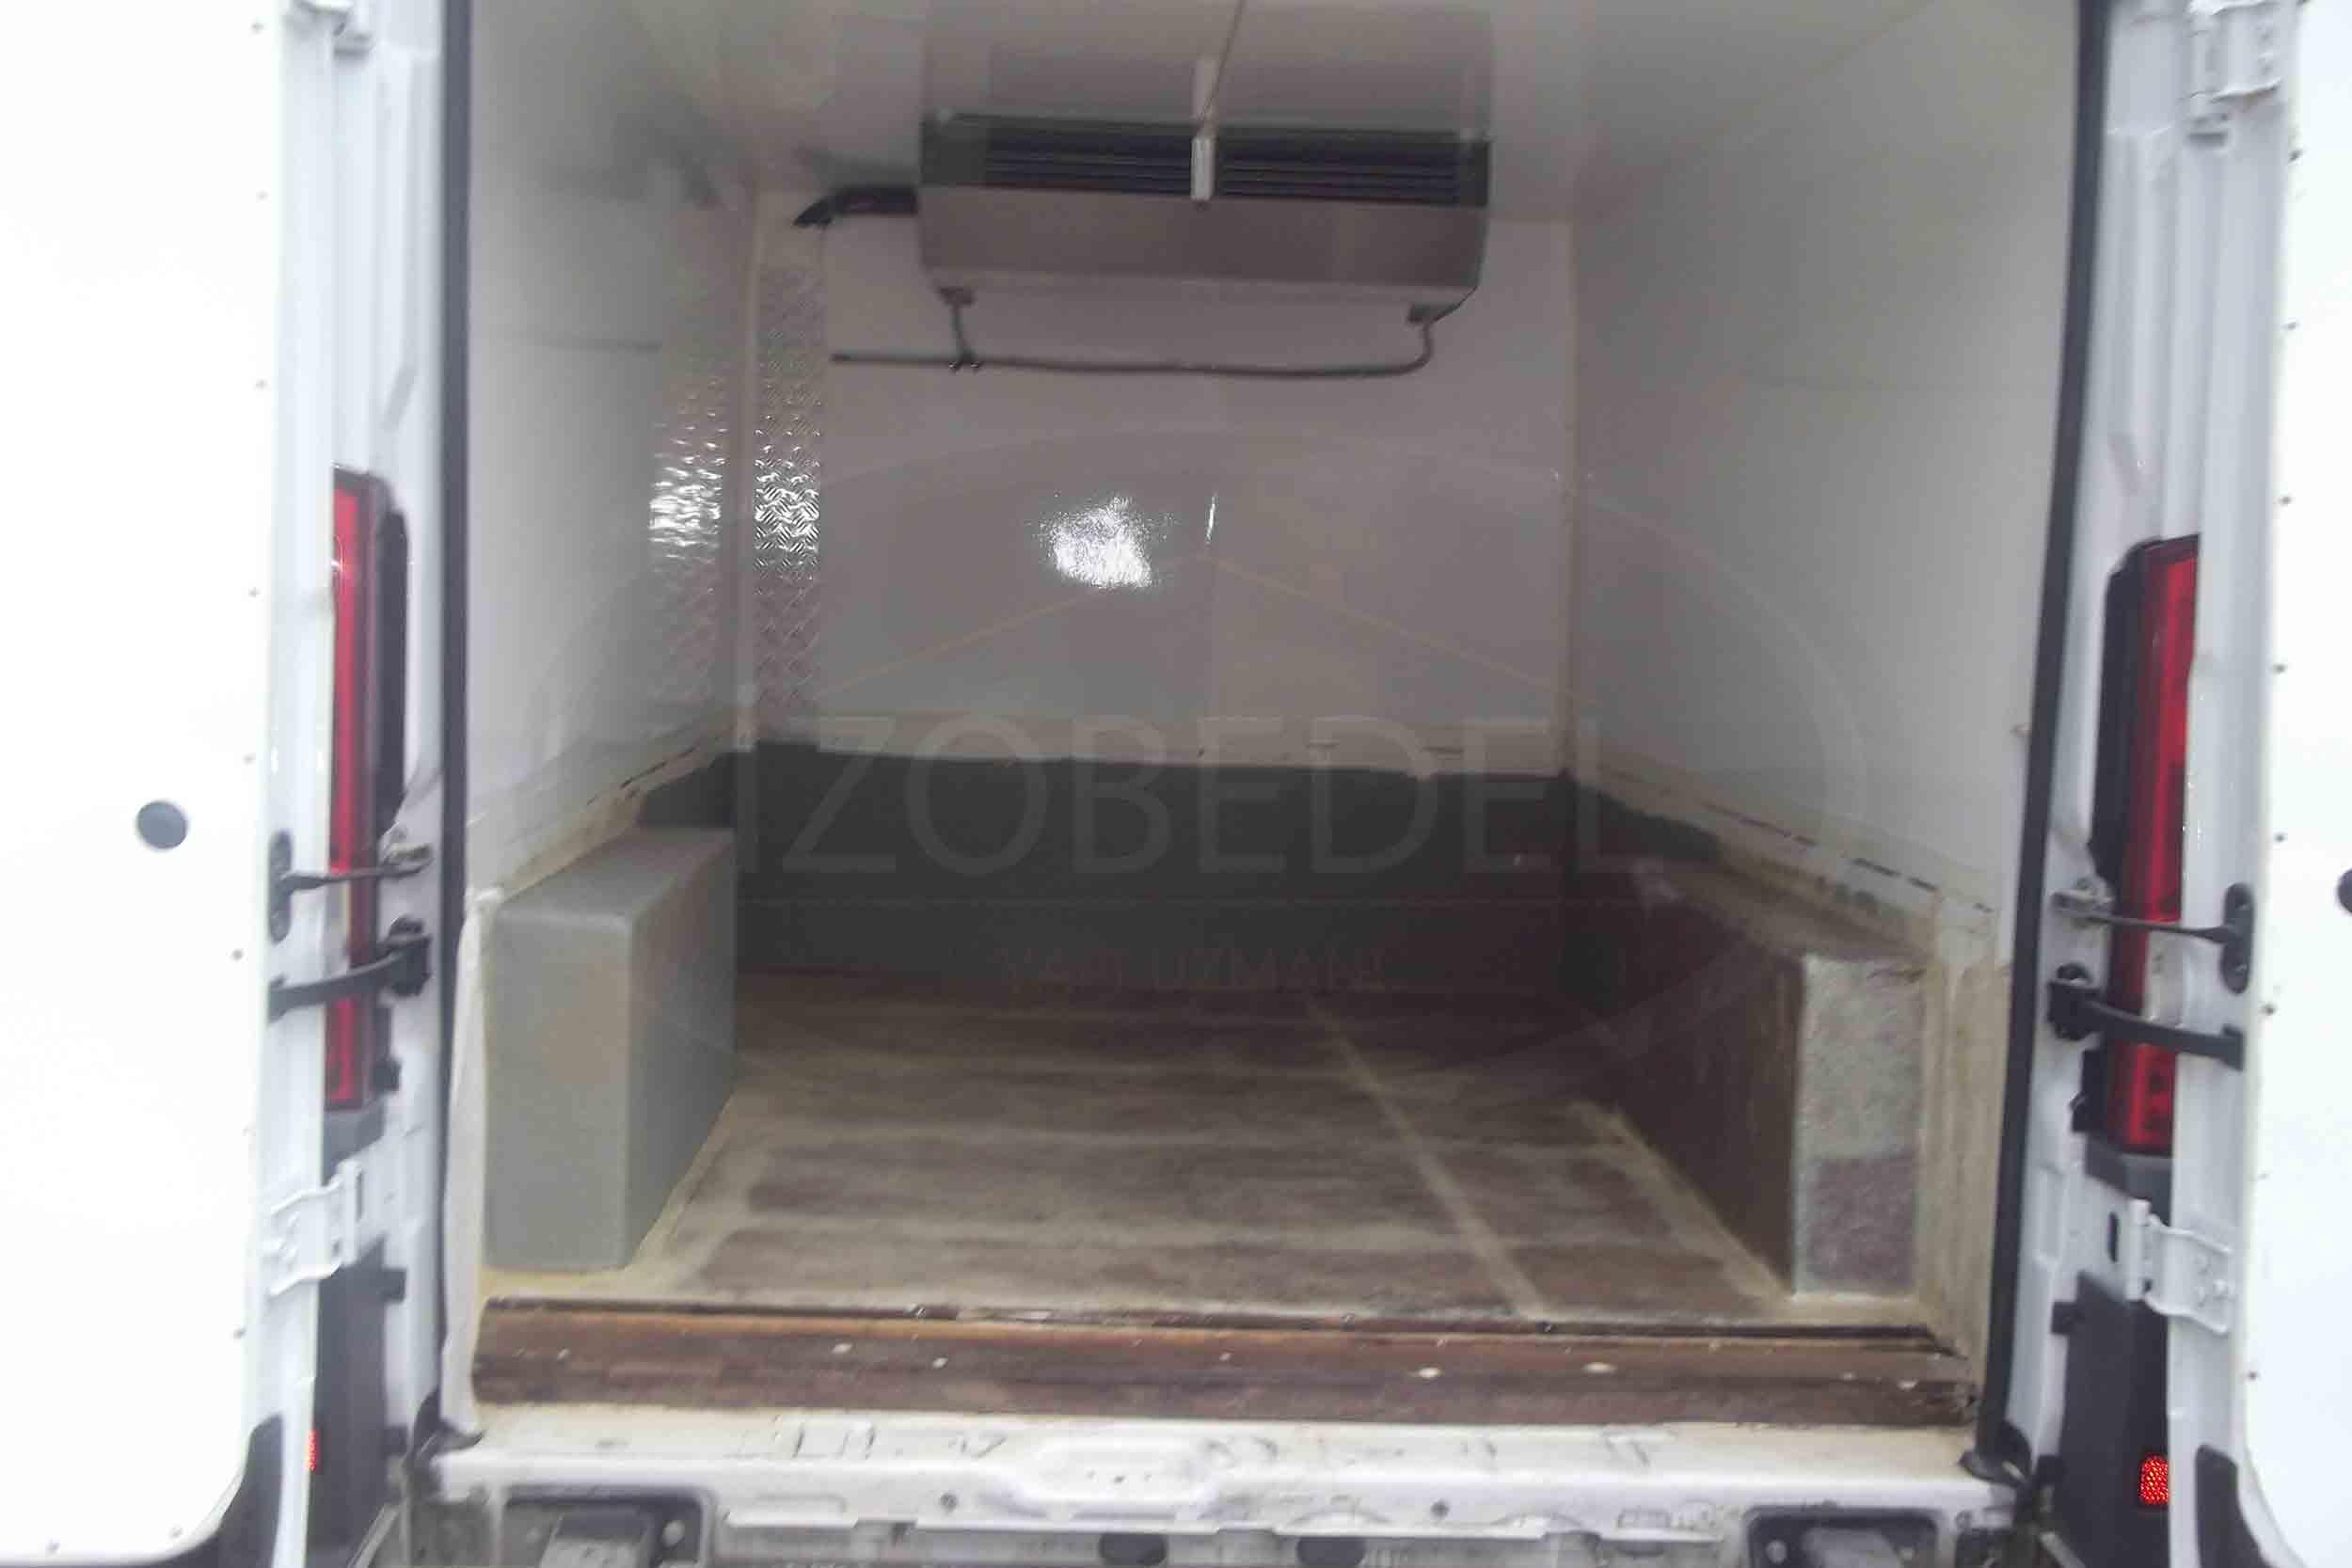 sprey-polyurea-araç-kasa-kaplama7